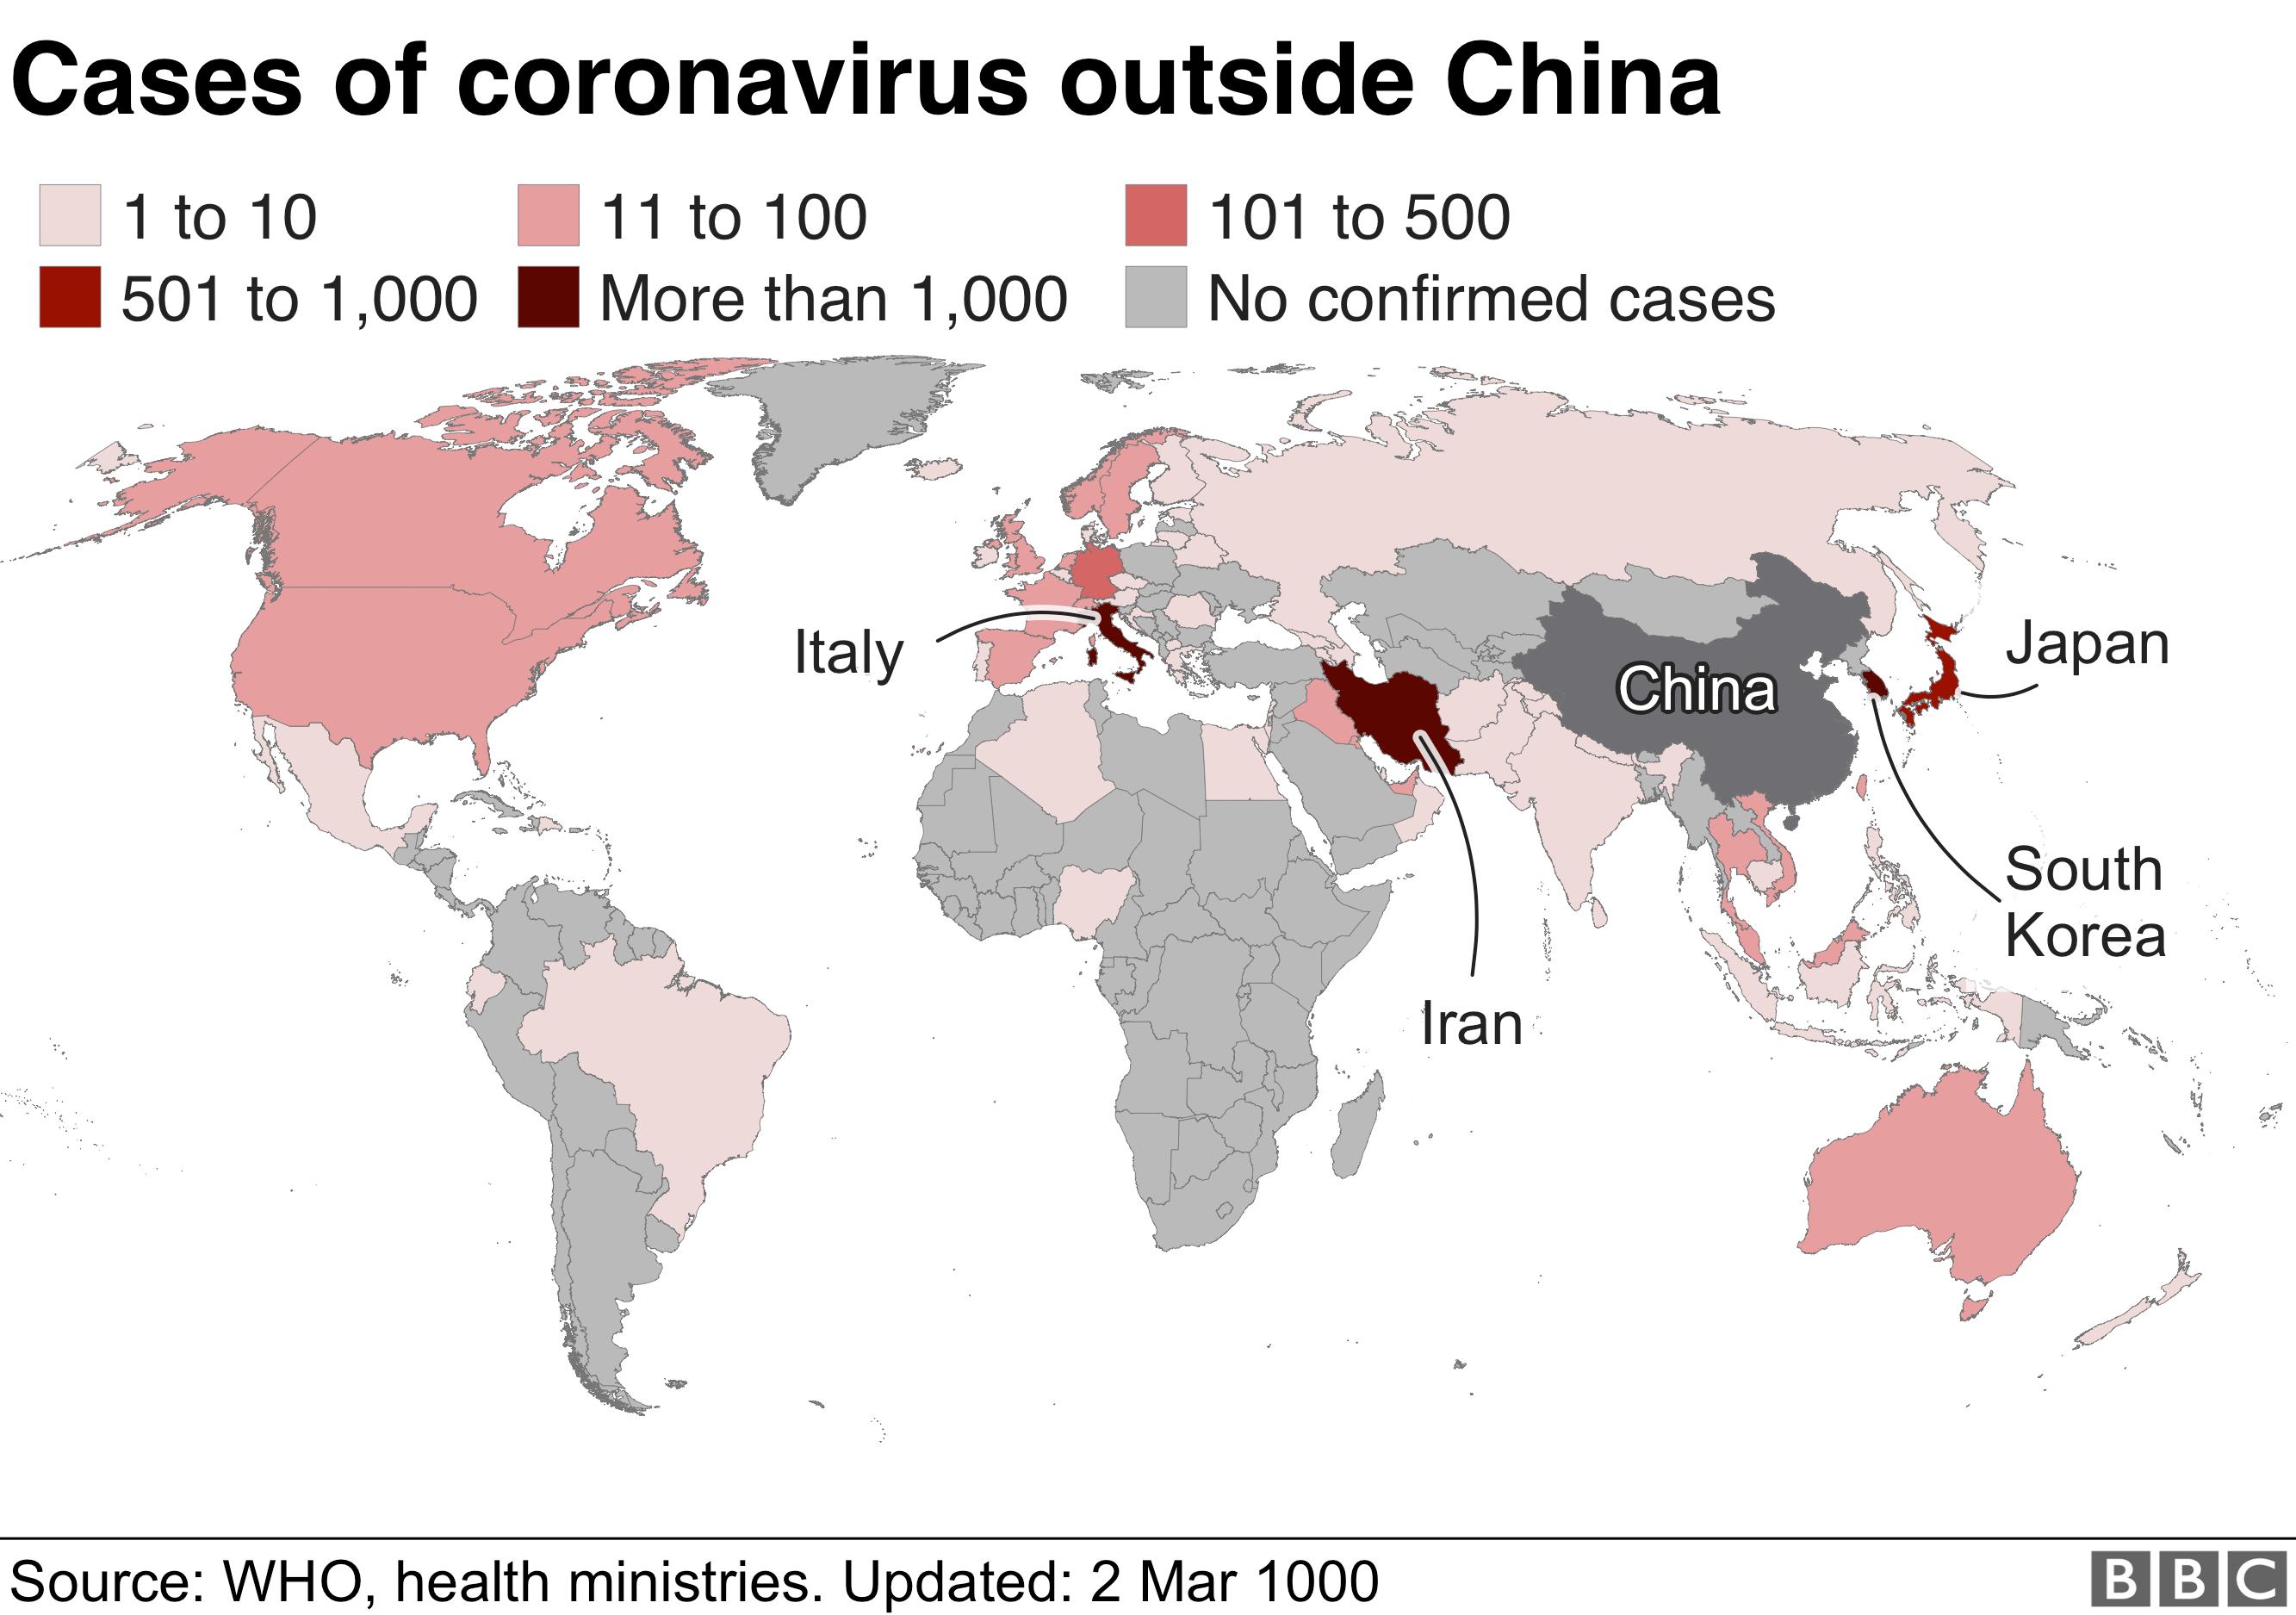 Map showing global cases of coronavirus